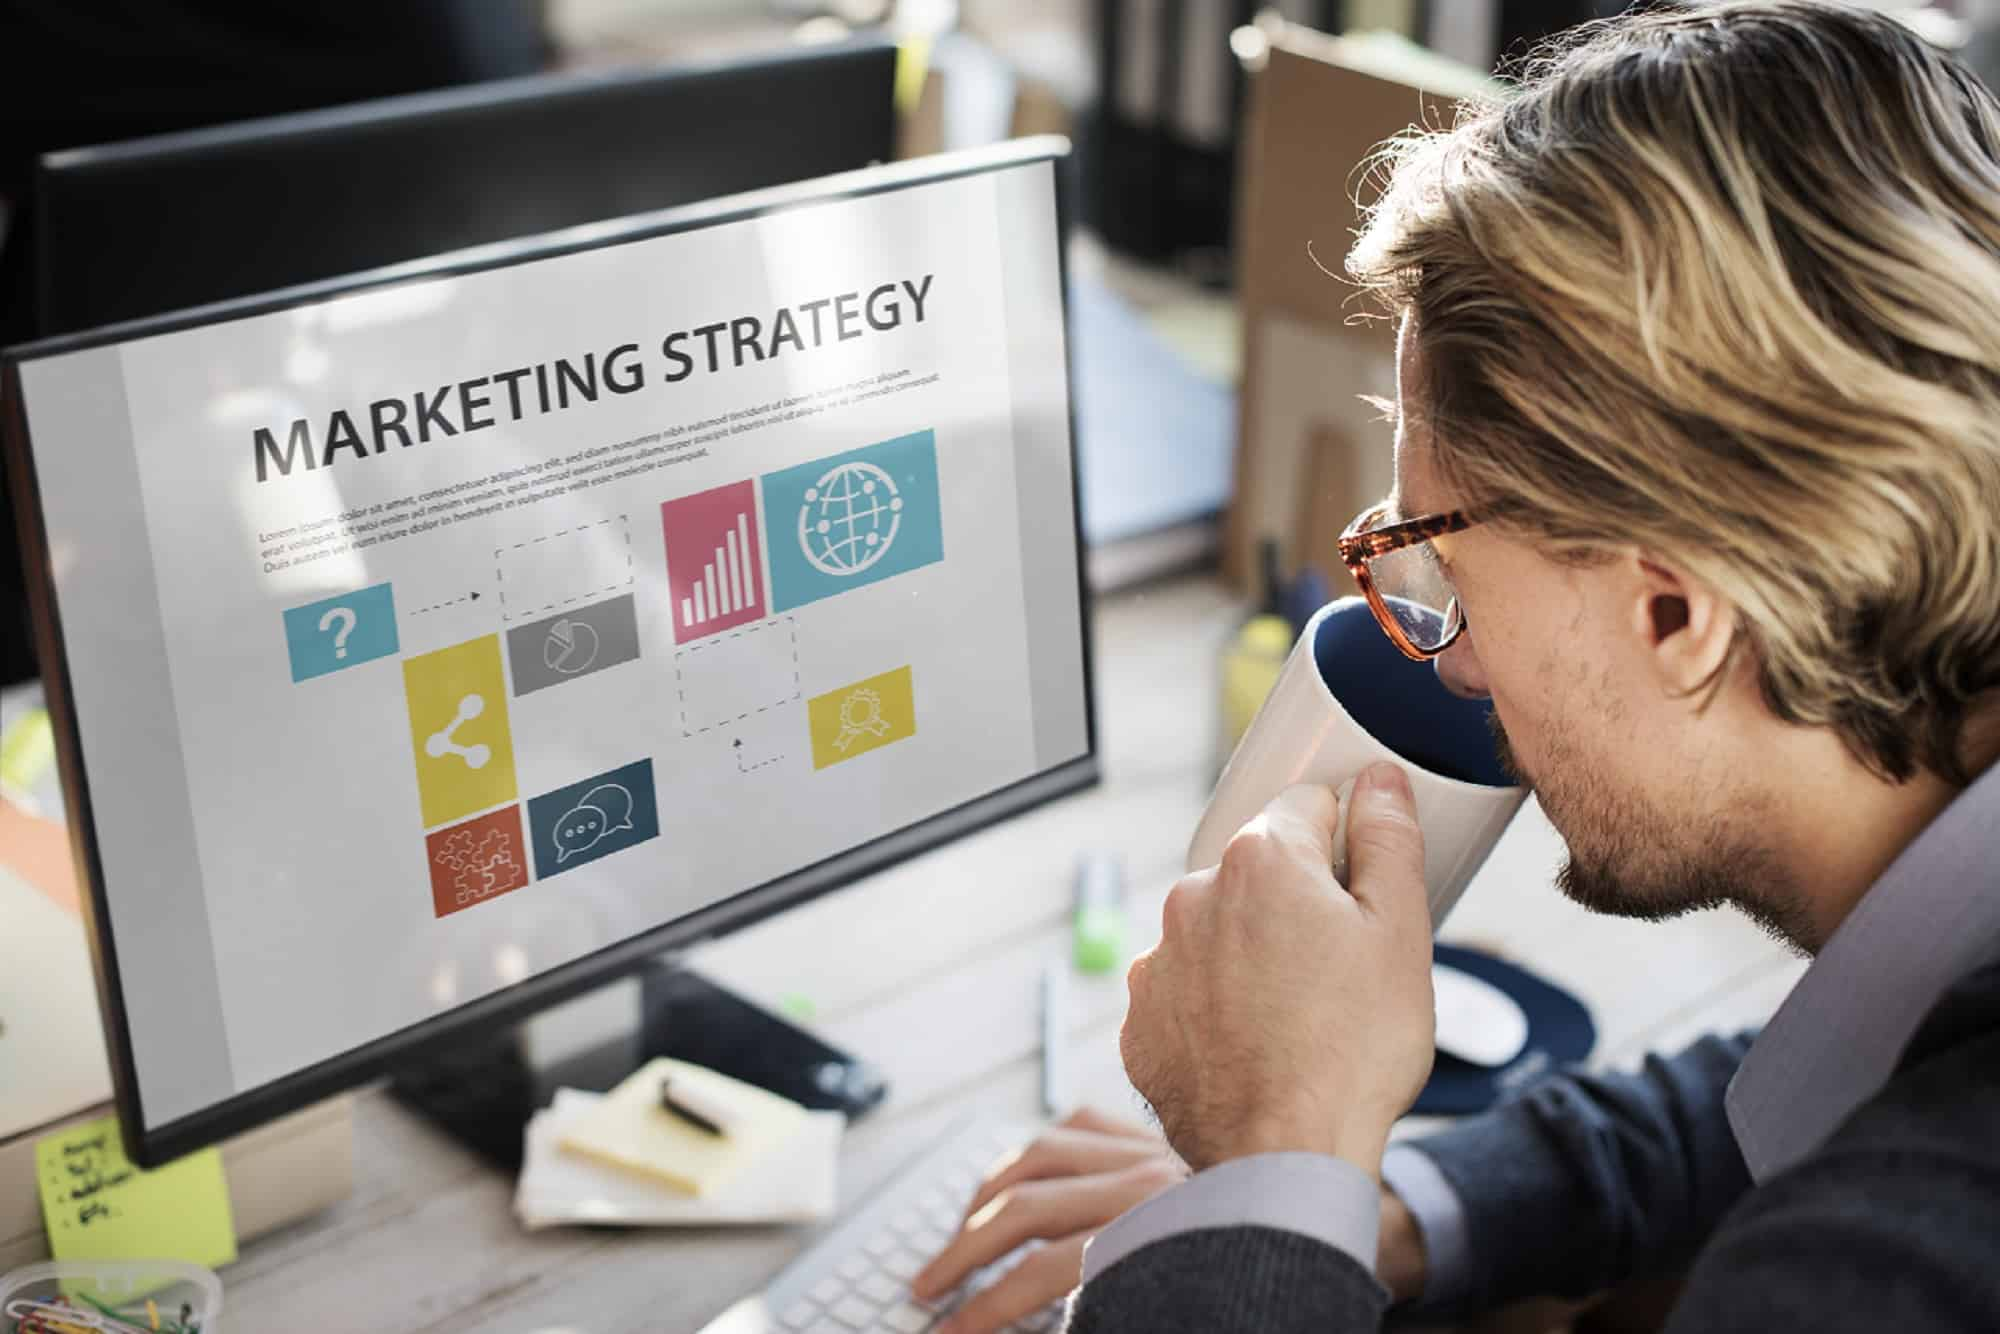 Quality inbound marketing fosters brand reputation